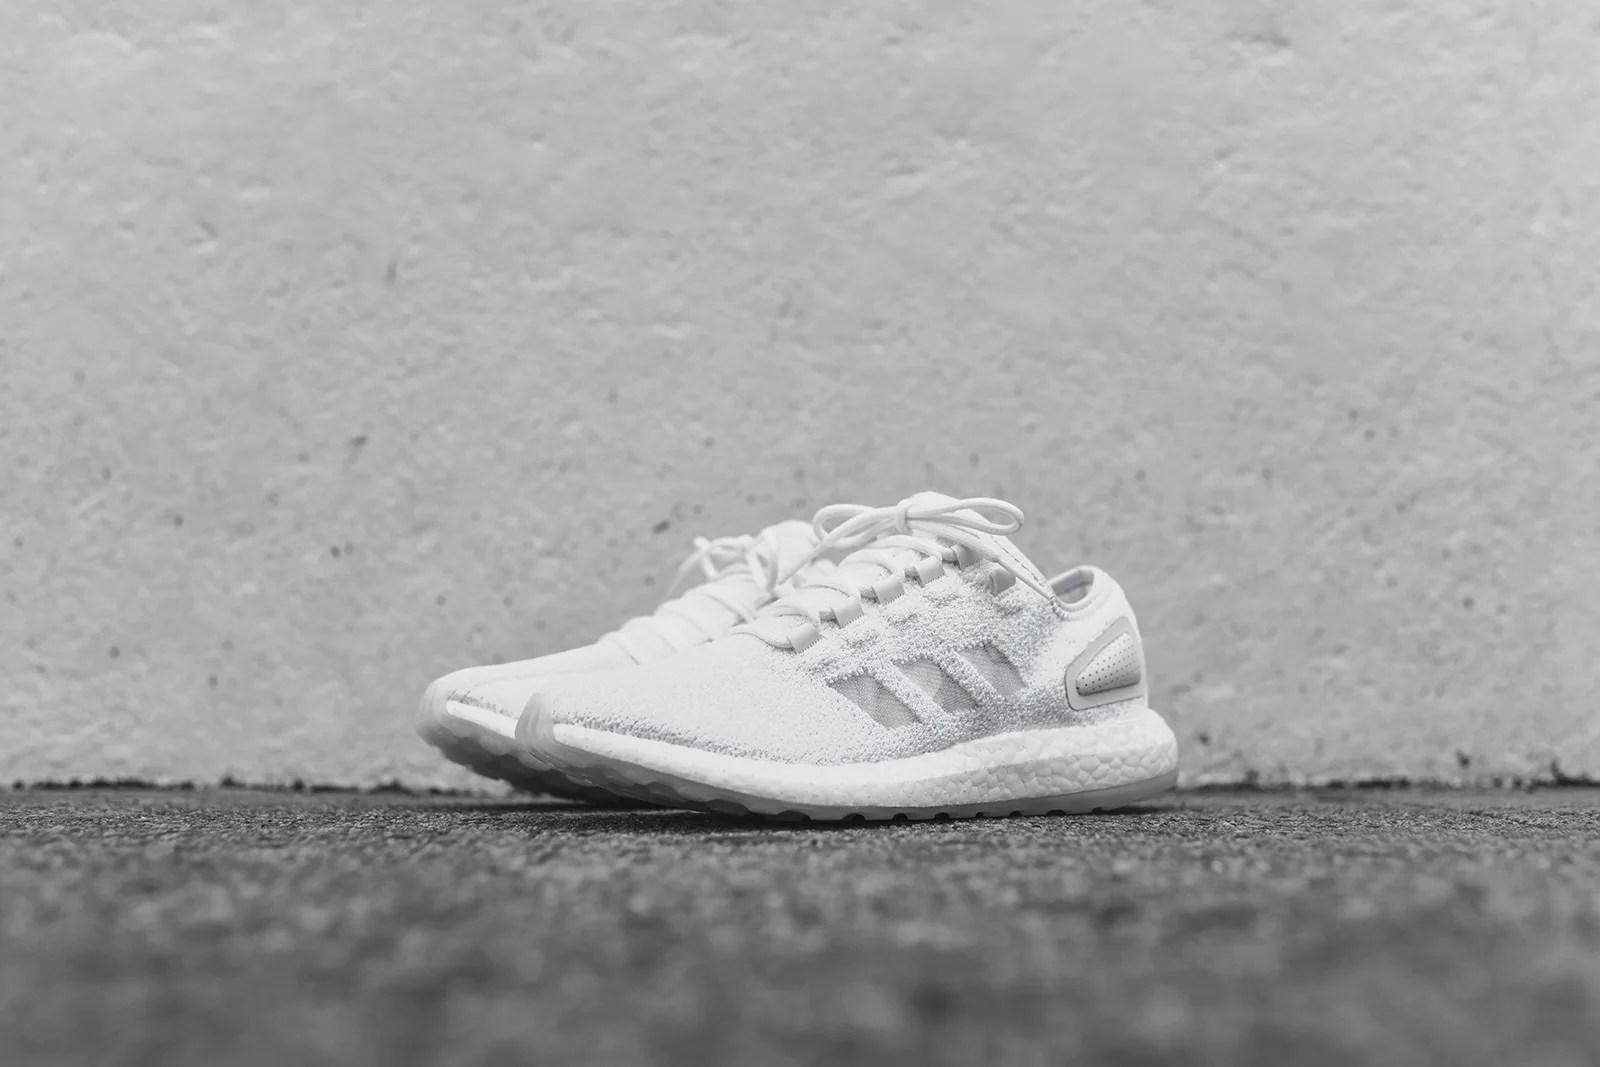 Adidas Consortium X Sneakerboy X Wish ClimaCool 1 PK Amp PureBoost Pack